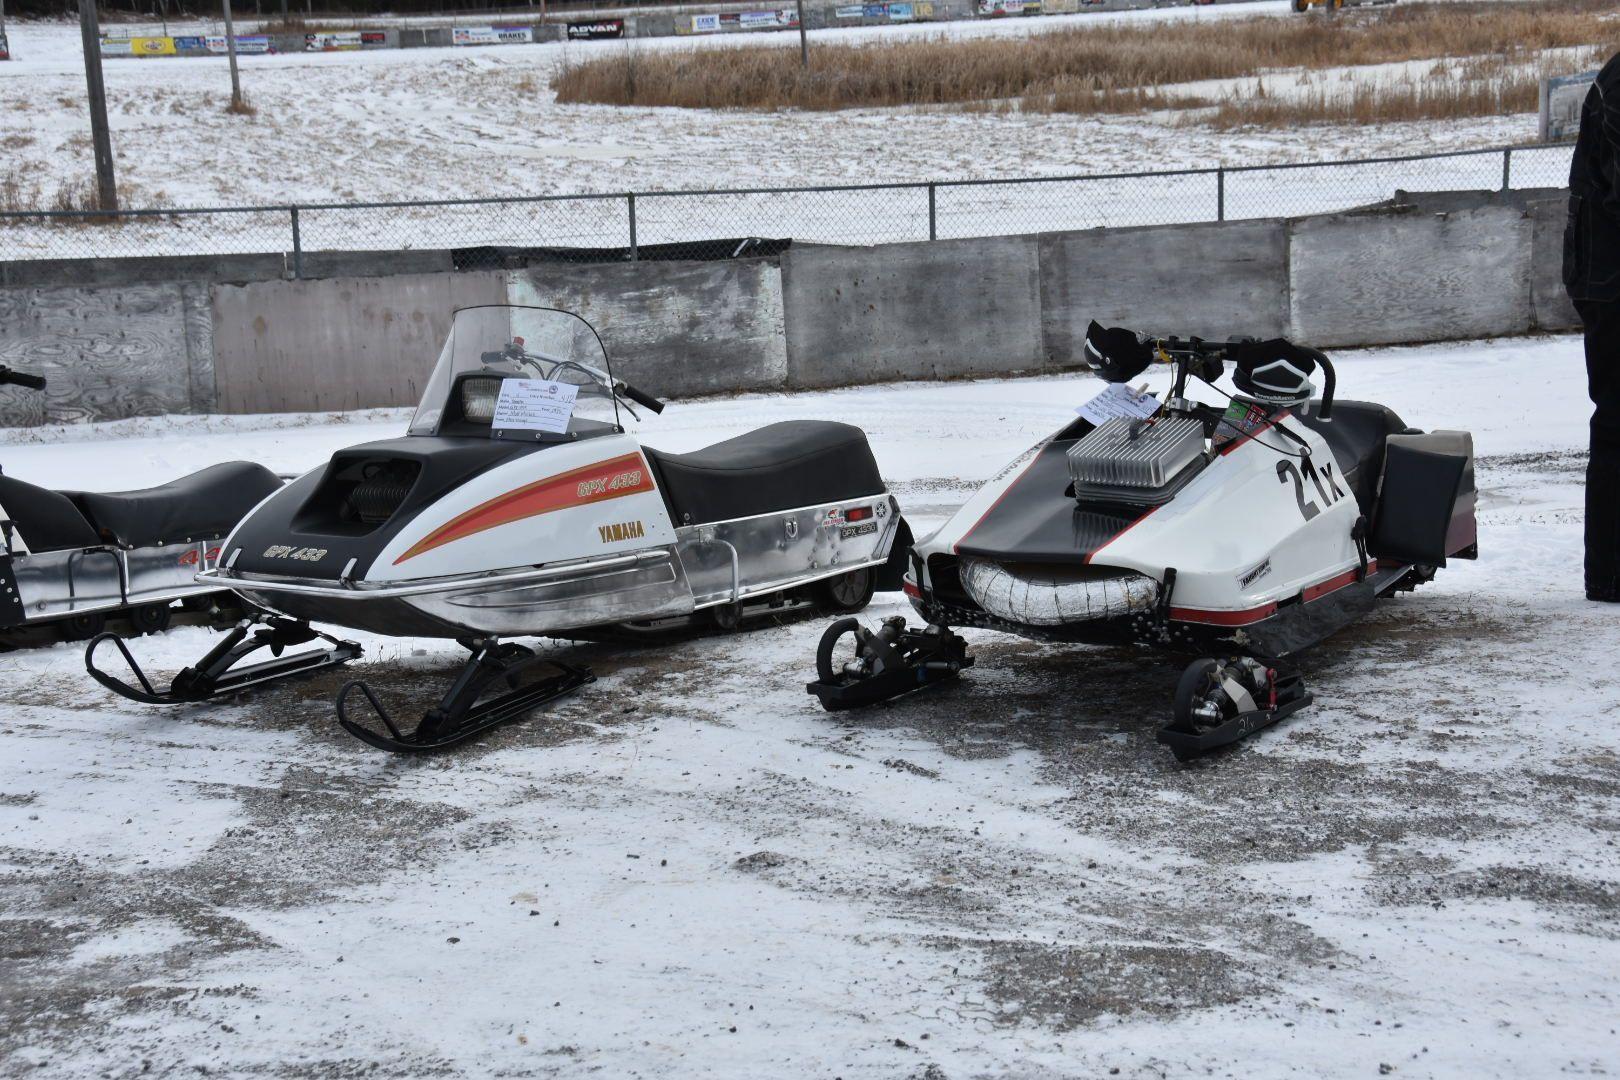 Pin By Bill Hurlin On Snowmobile Snowmobile Snow Fun Sleds